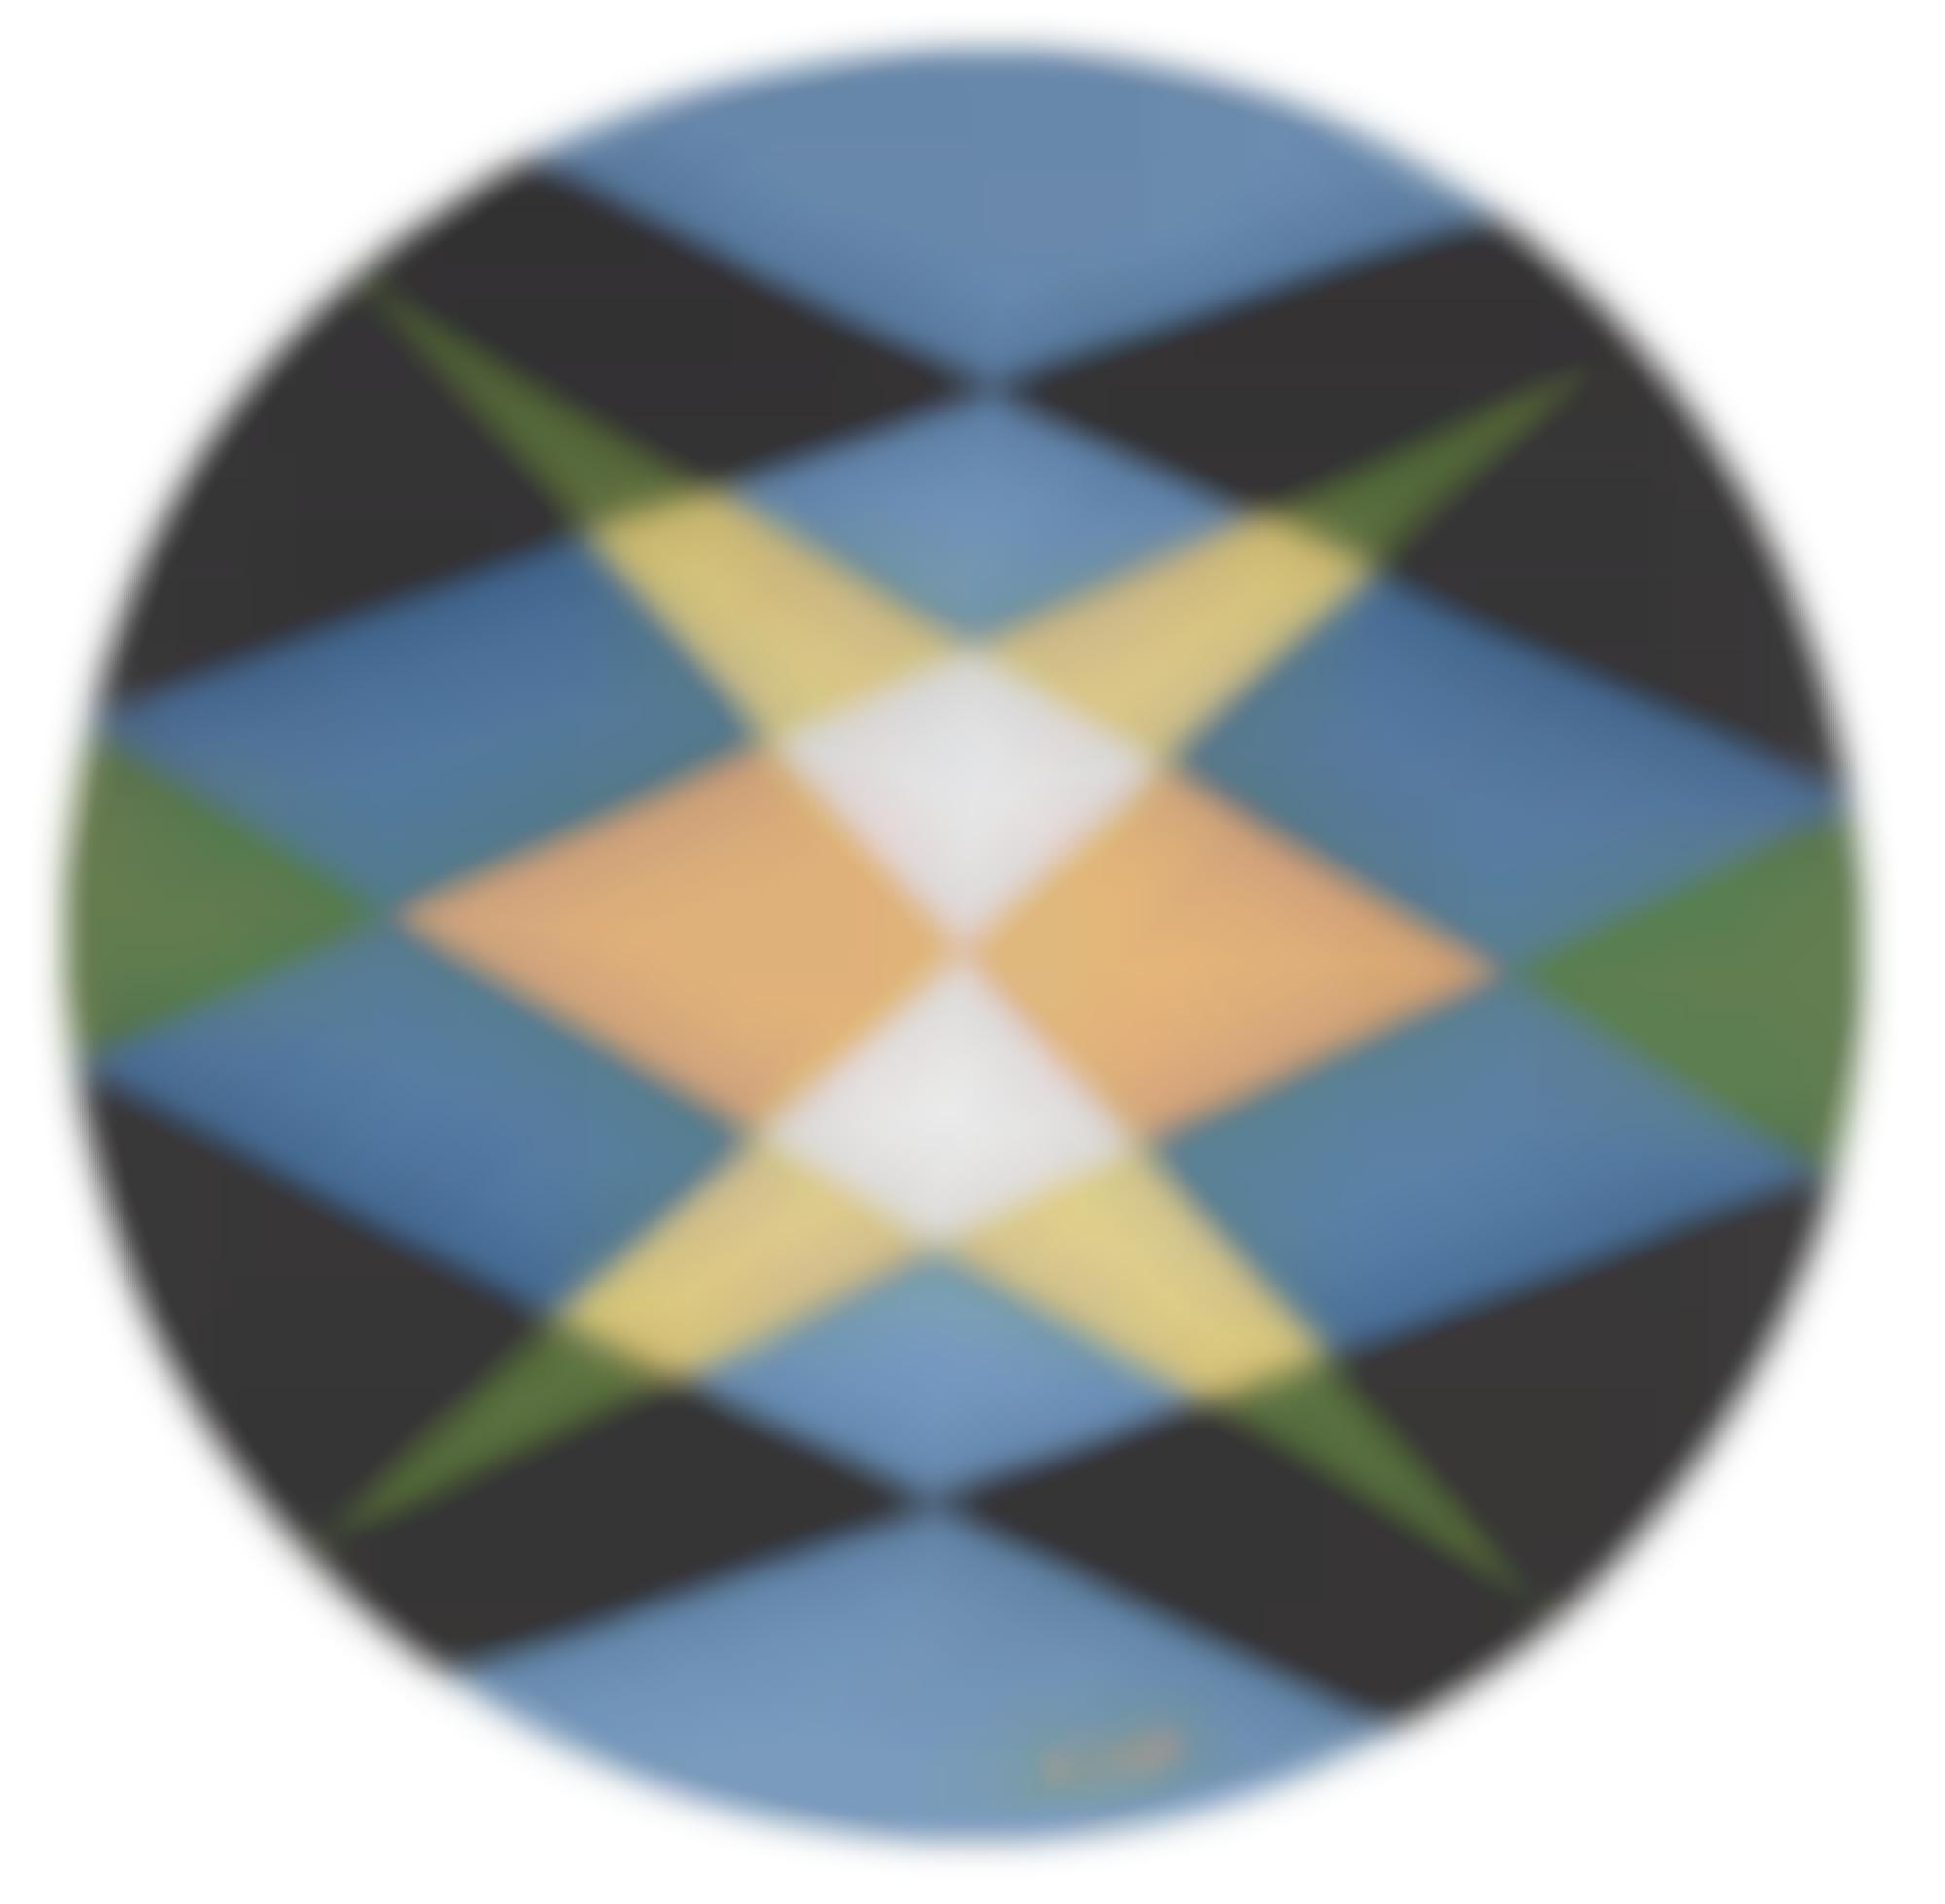 Giacomo Balla-Motivo Geometrico (Geometric Motif)-1920